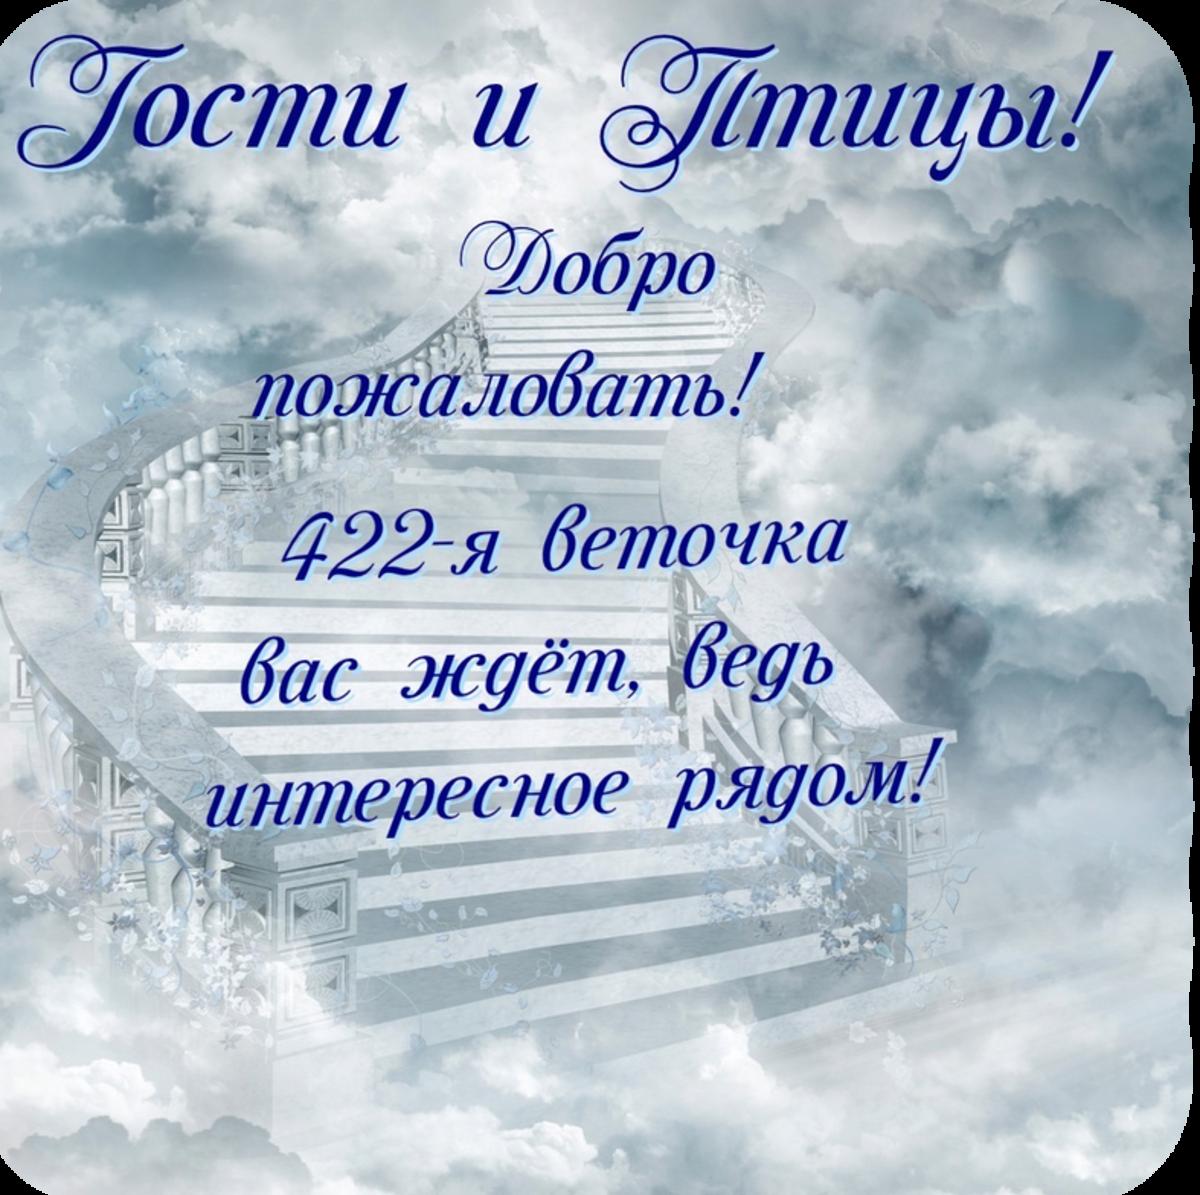 http://s4.uploads.ru/vlcYJ.png